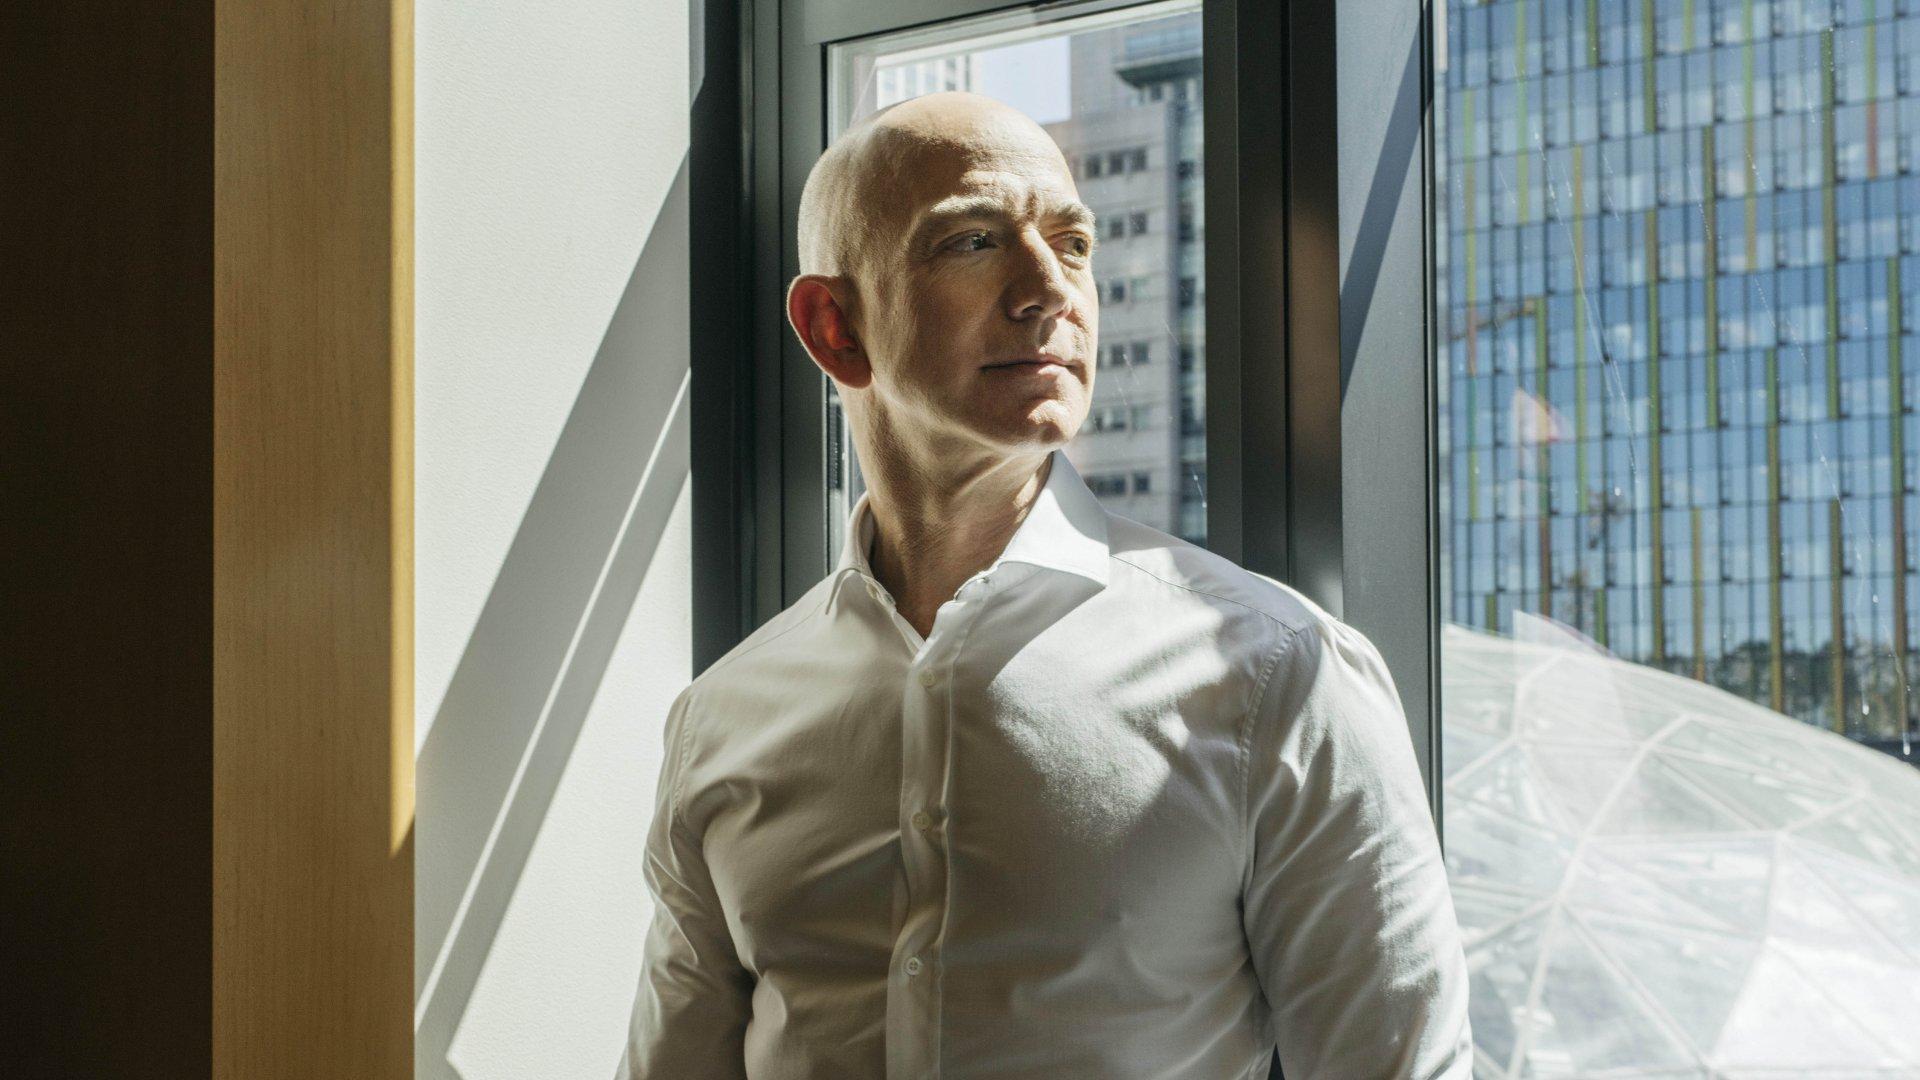 Amazon CEO, Jeff Bezos